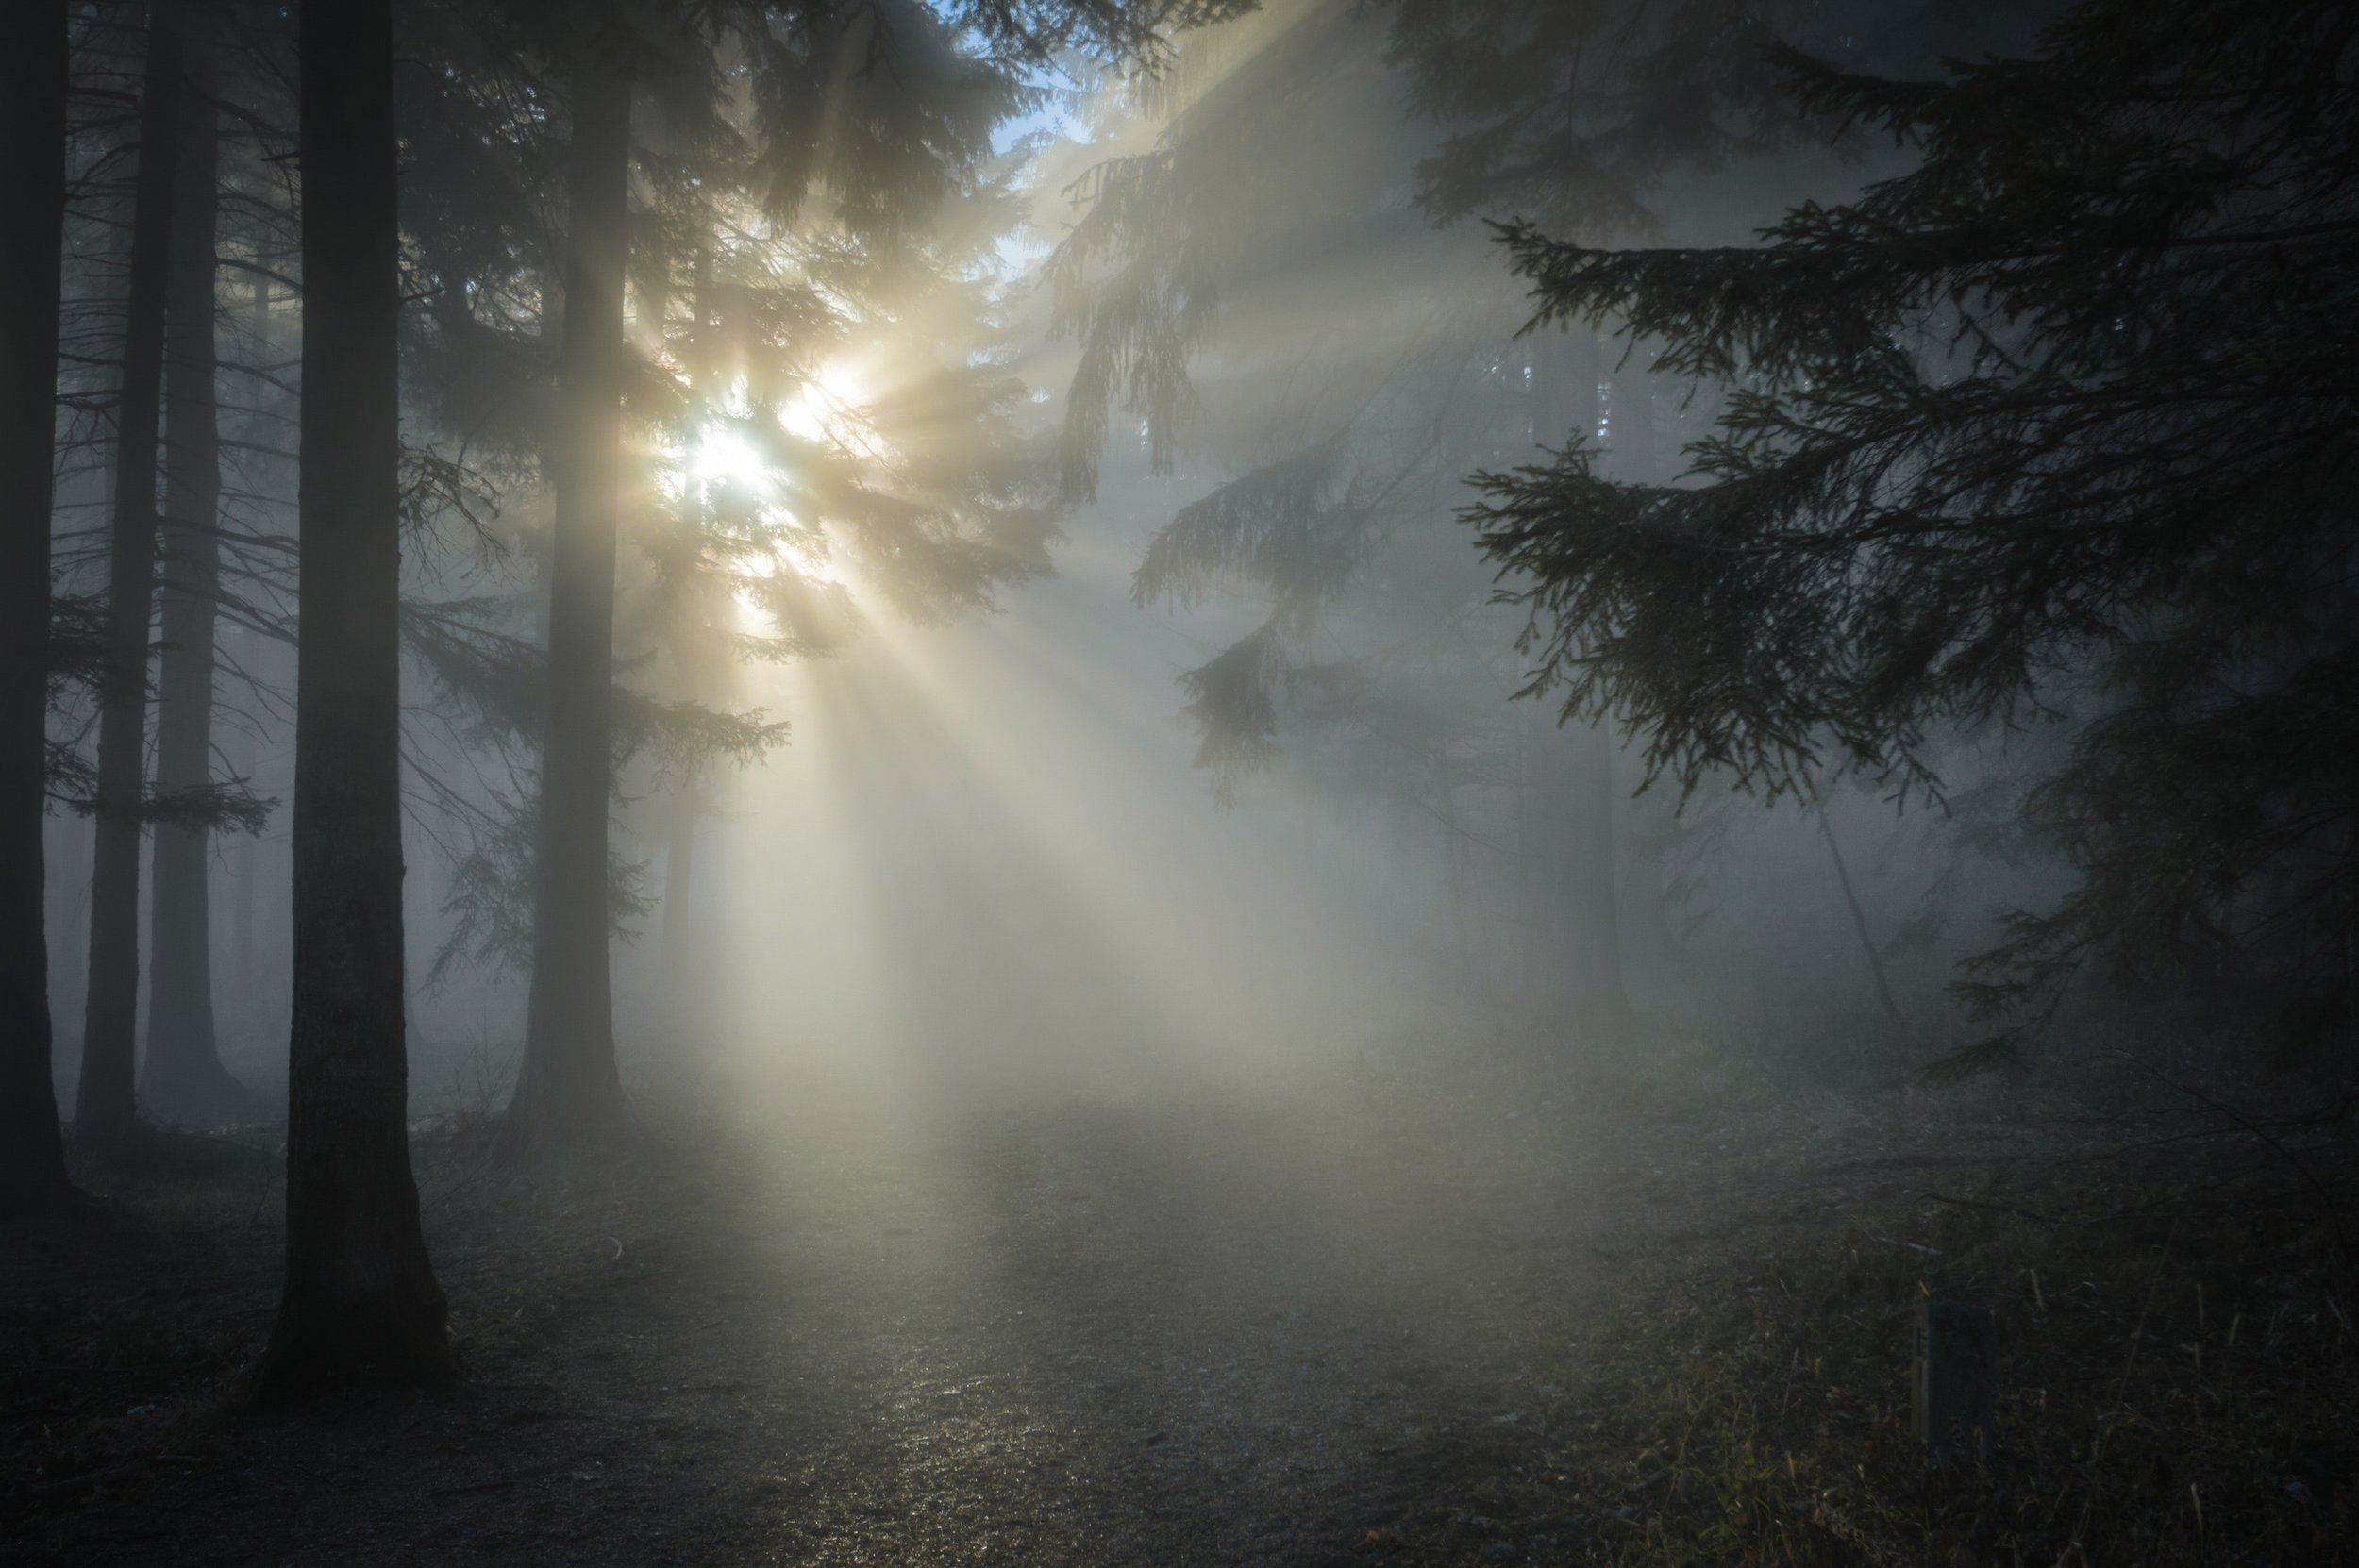 Misty conifers